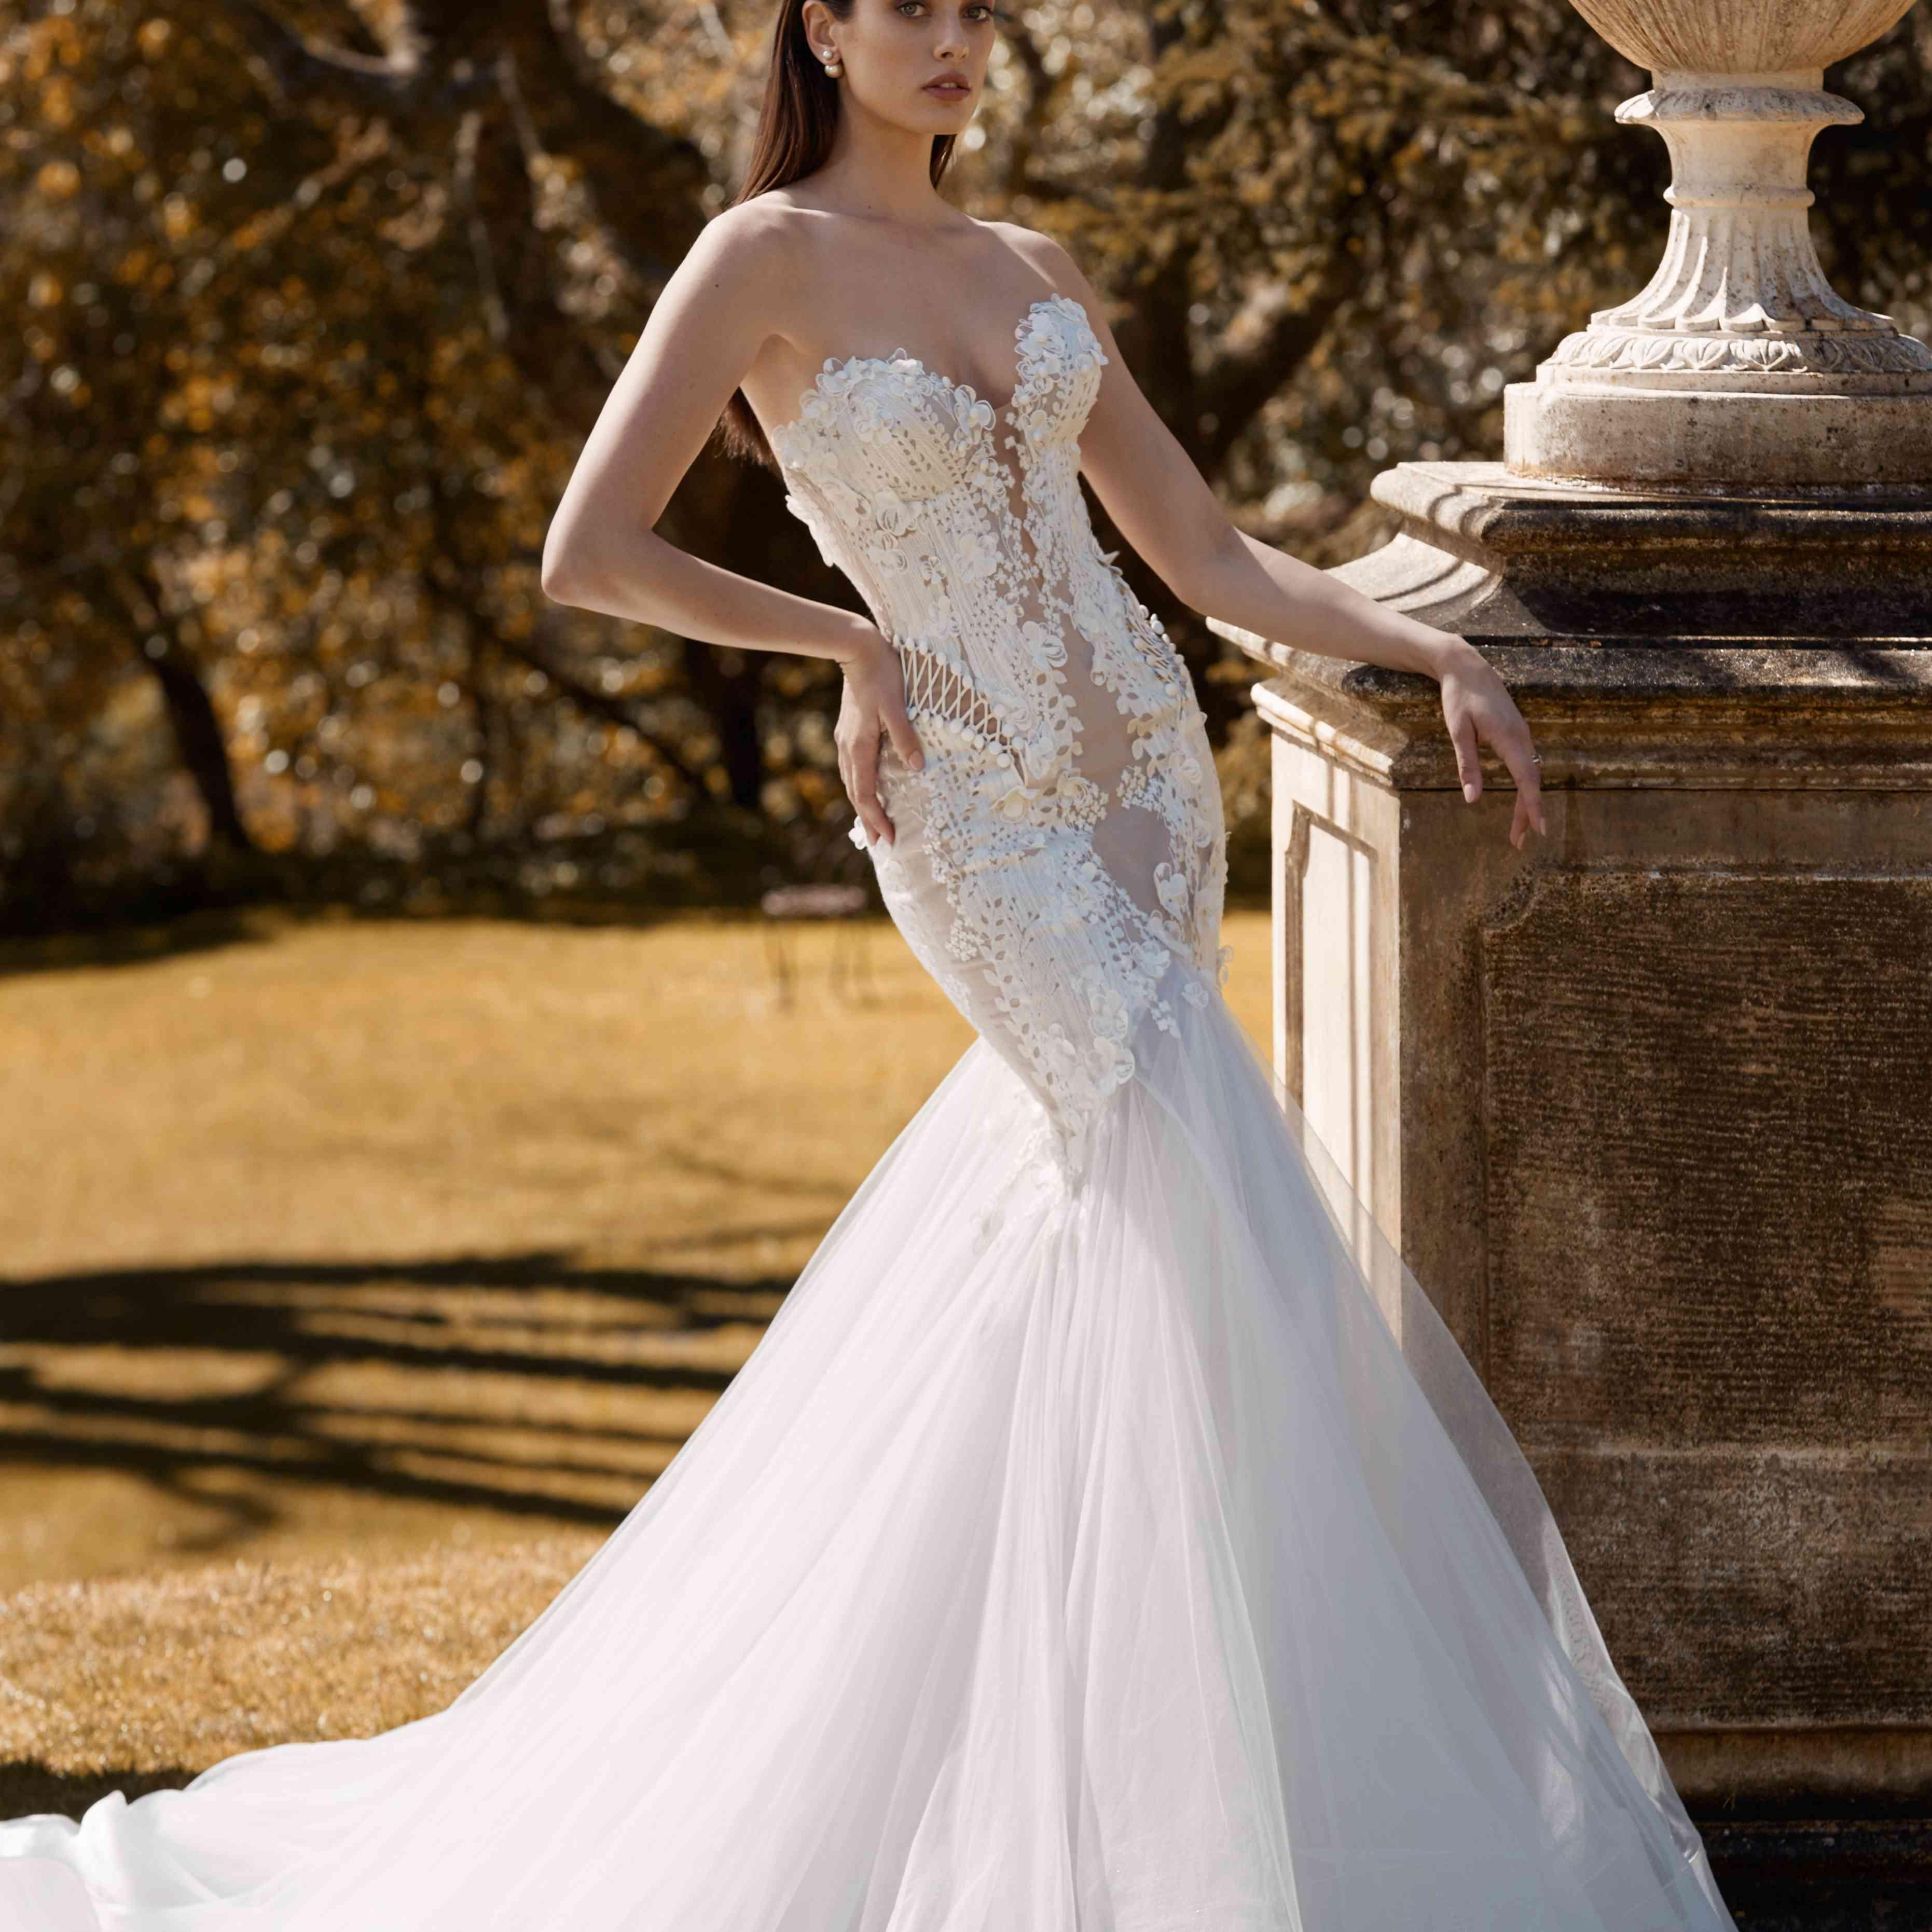 Gabrielle strapless mermaid wedding dress